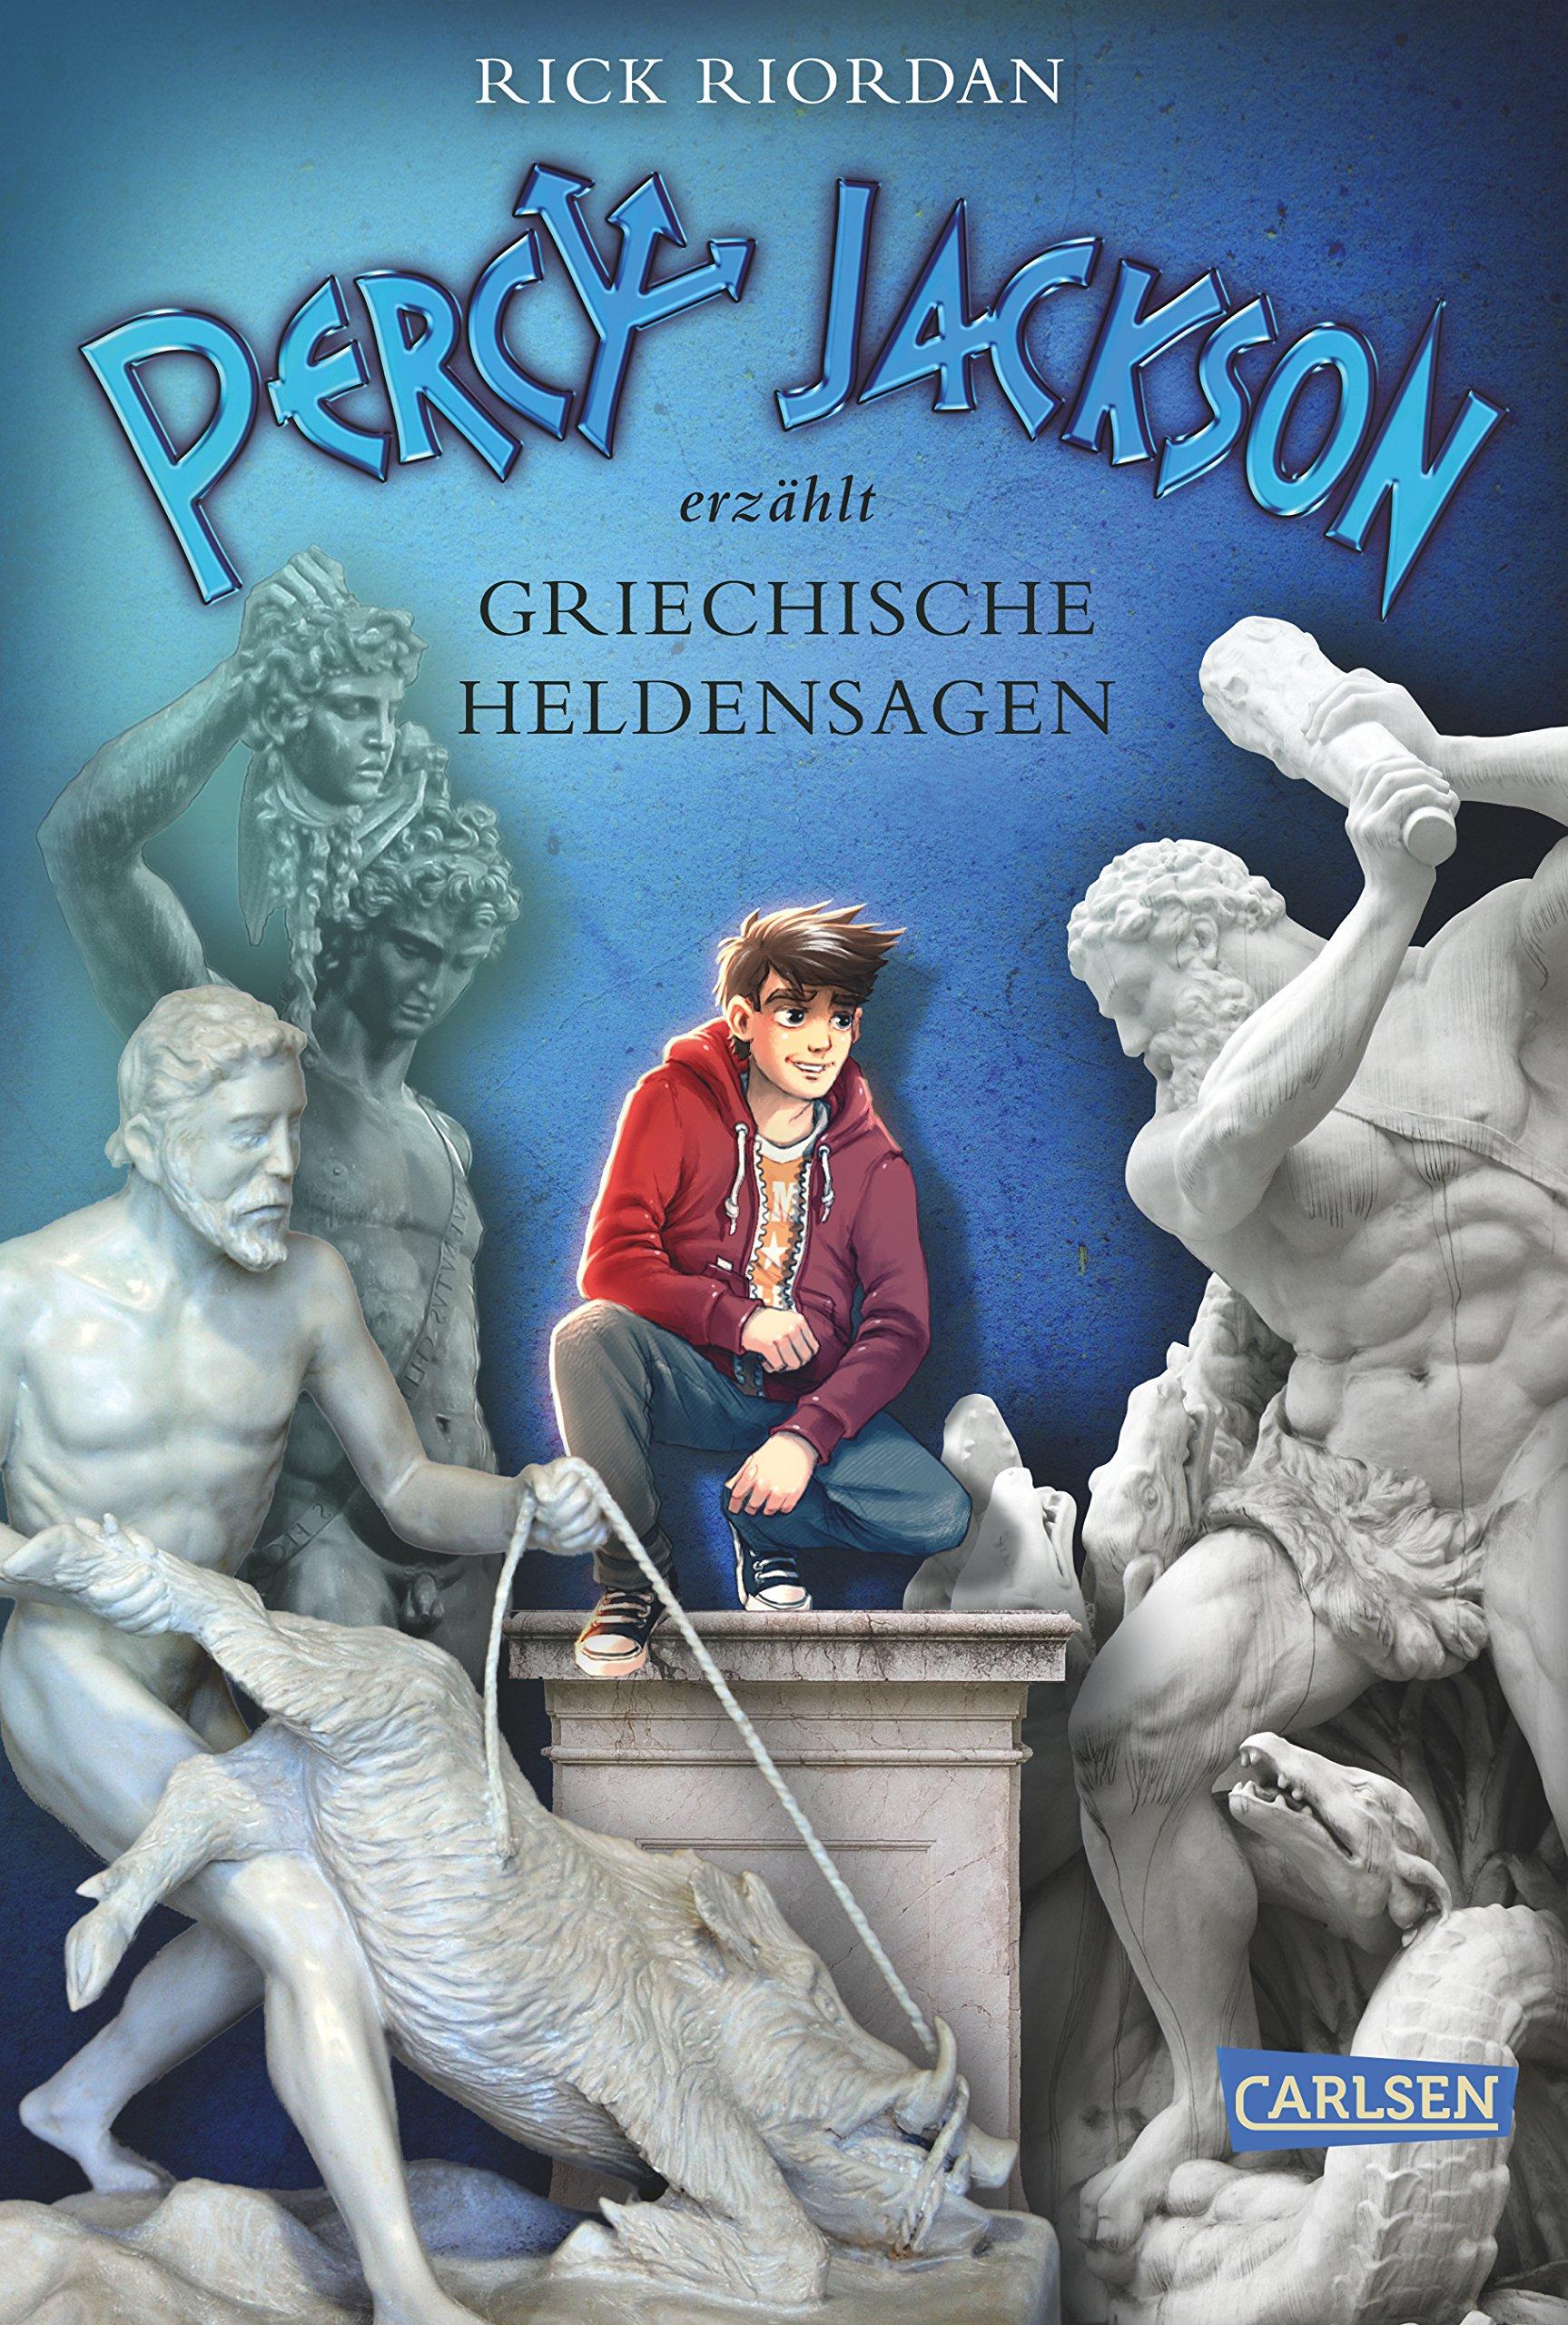 Percy Jackson erzahlt: Griechische Heldensagen percy jackson 5 bde